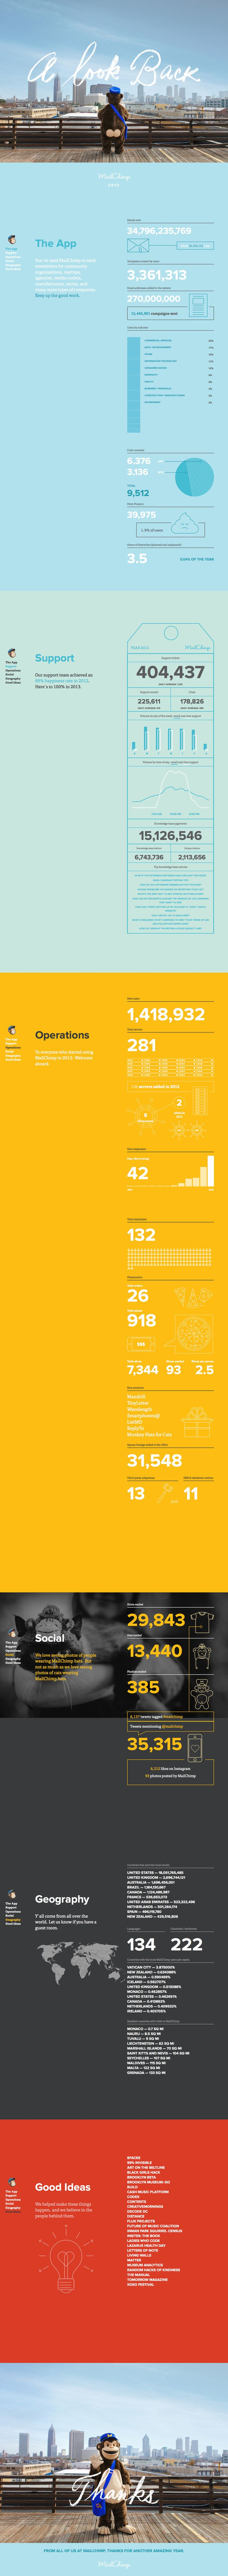 Healthcare-Advertising-MailChimp-Annual-Report Healthcare Advertising : MailChimp Annual Report